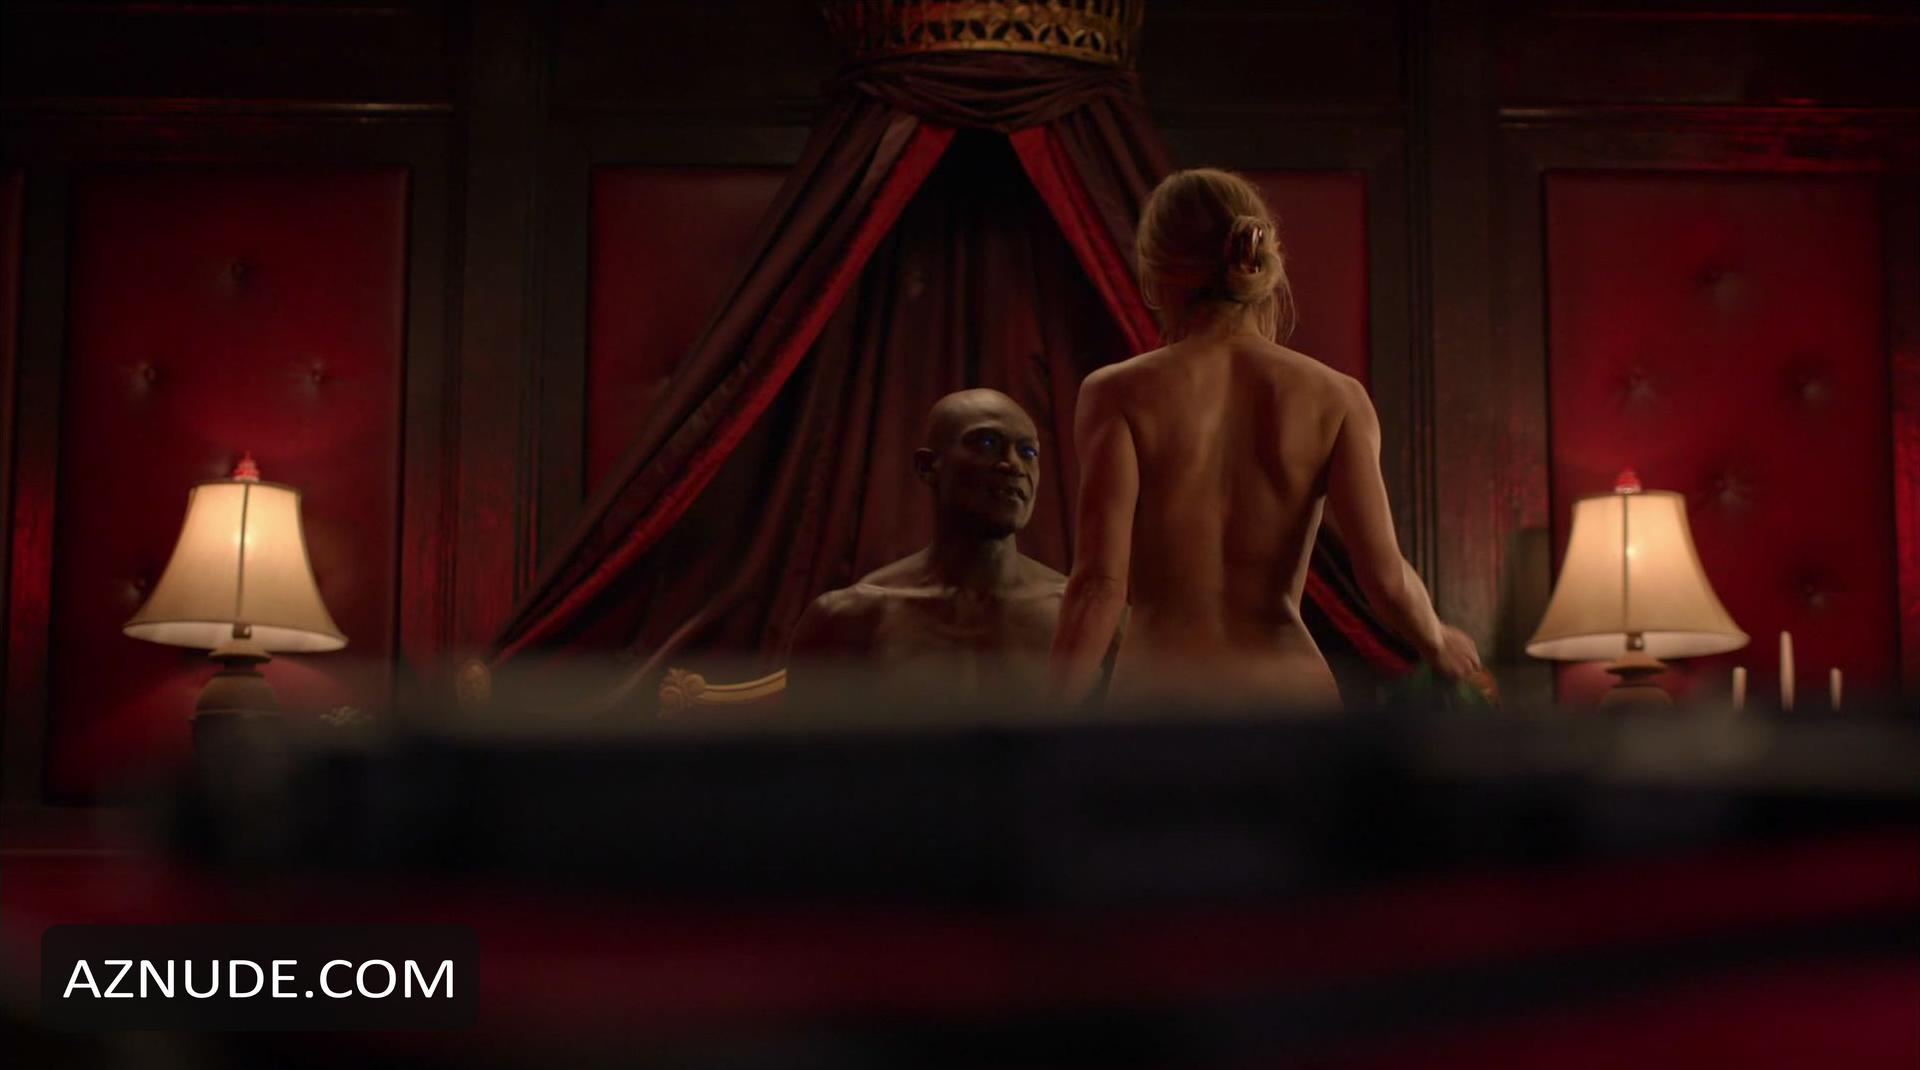 Intercrural sex